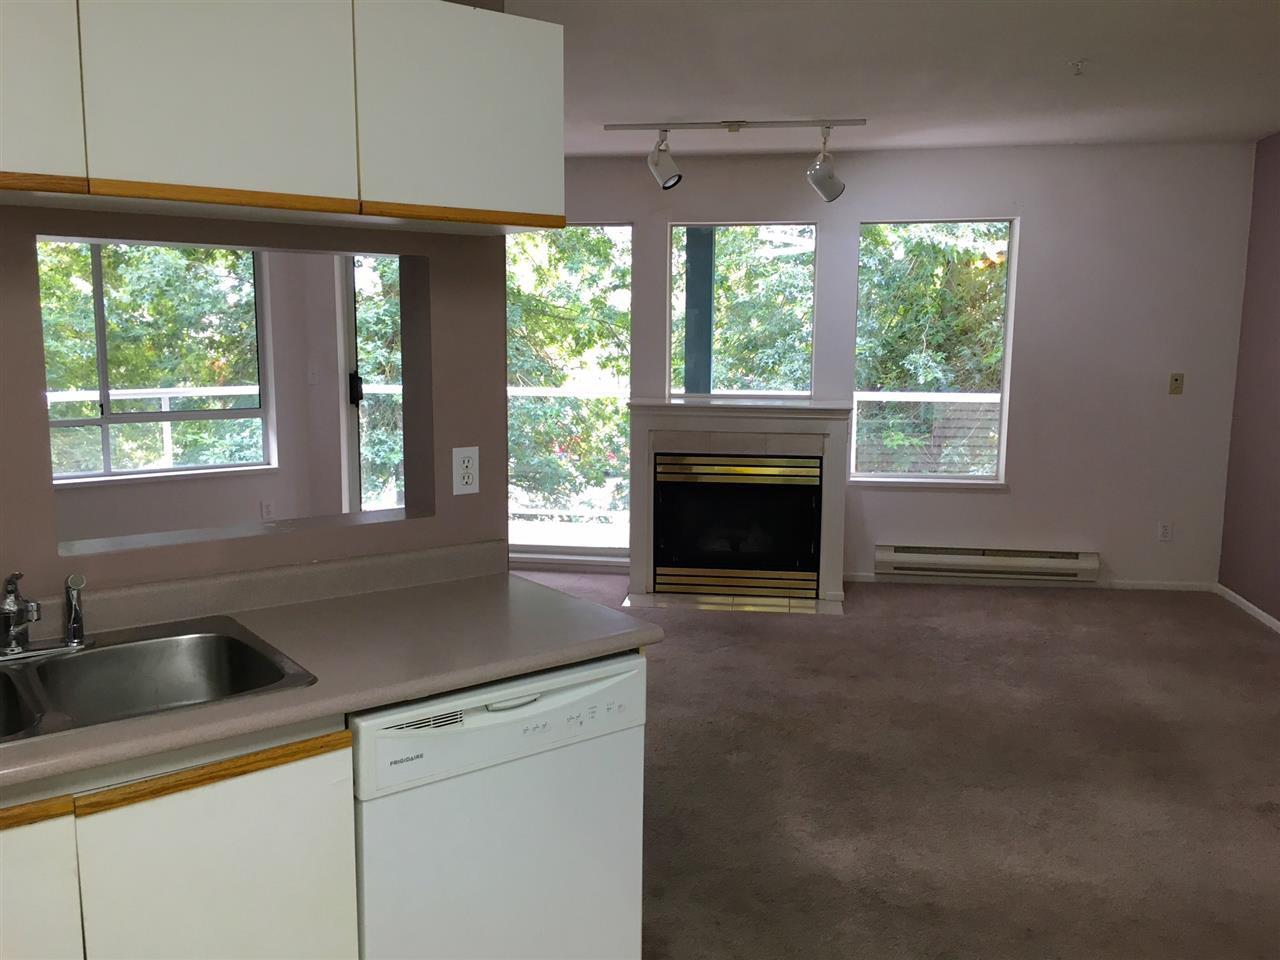 "Photo 4: Photos: 207 27358 32 Avenue in Langley: Aldergrove Langley Condo for sale in ""Willow Creek"" : MLS®# R2207746"